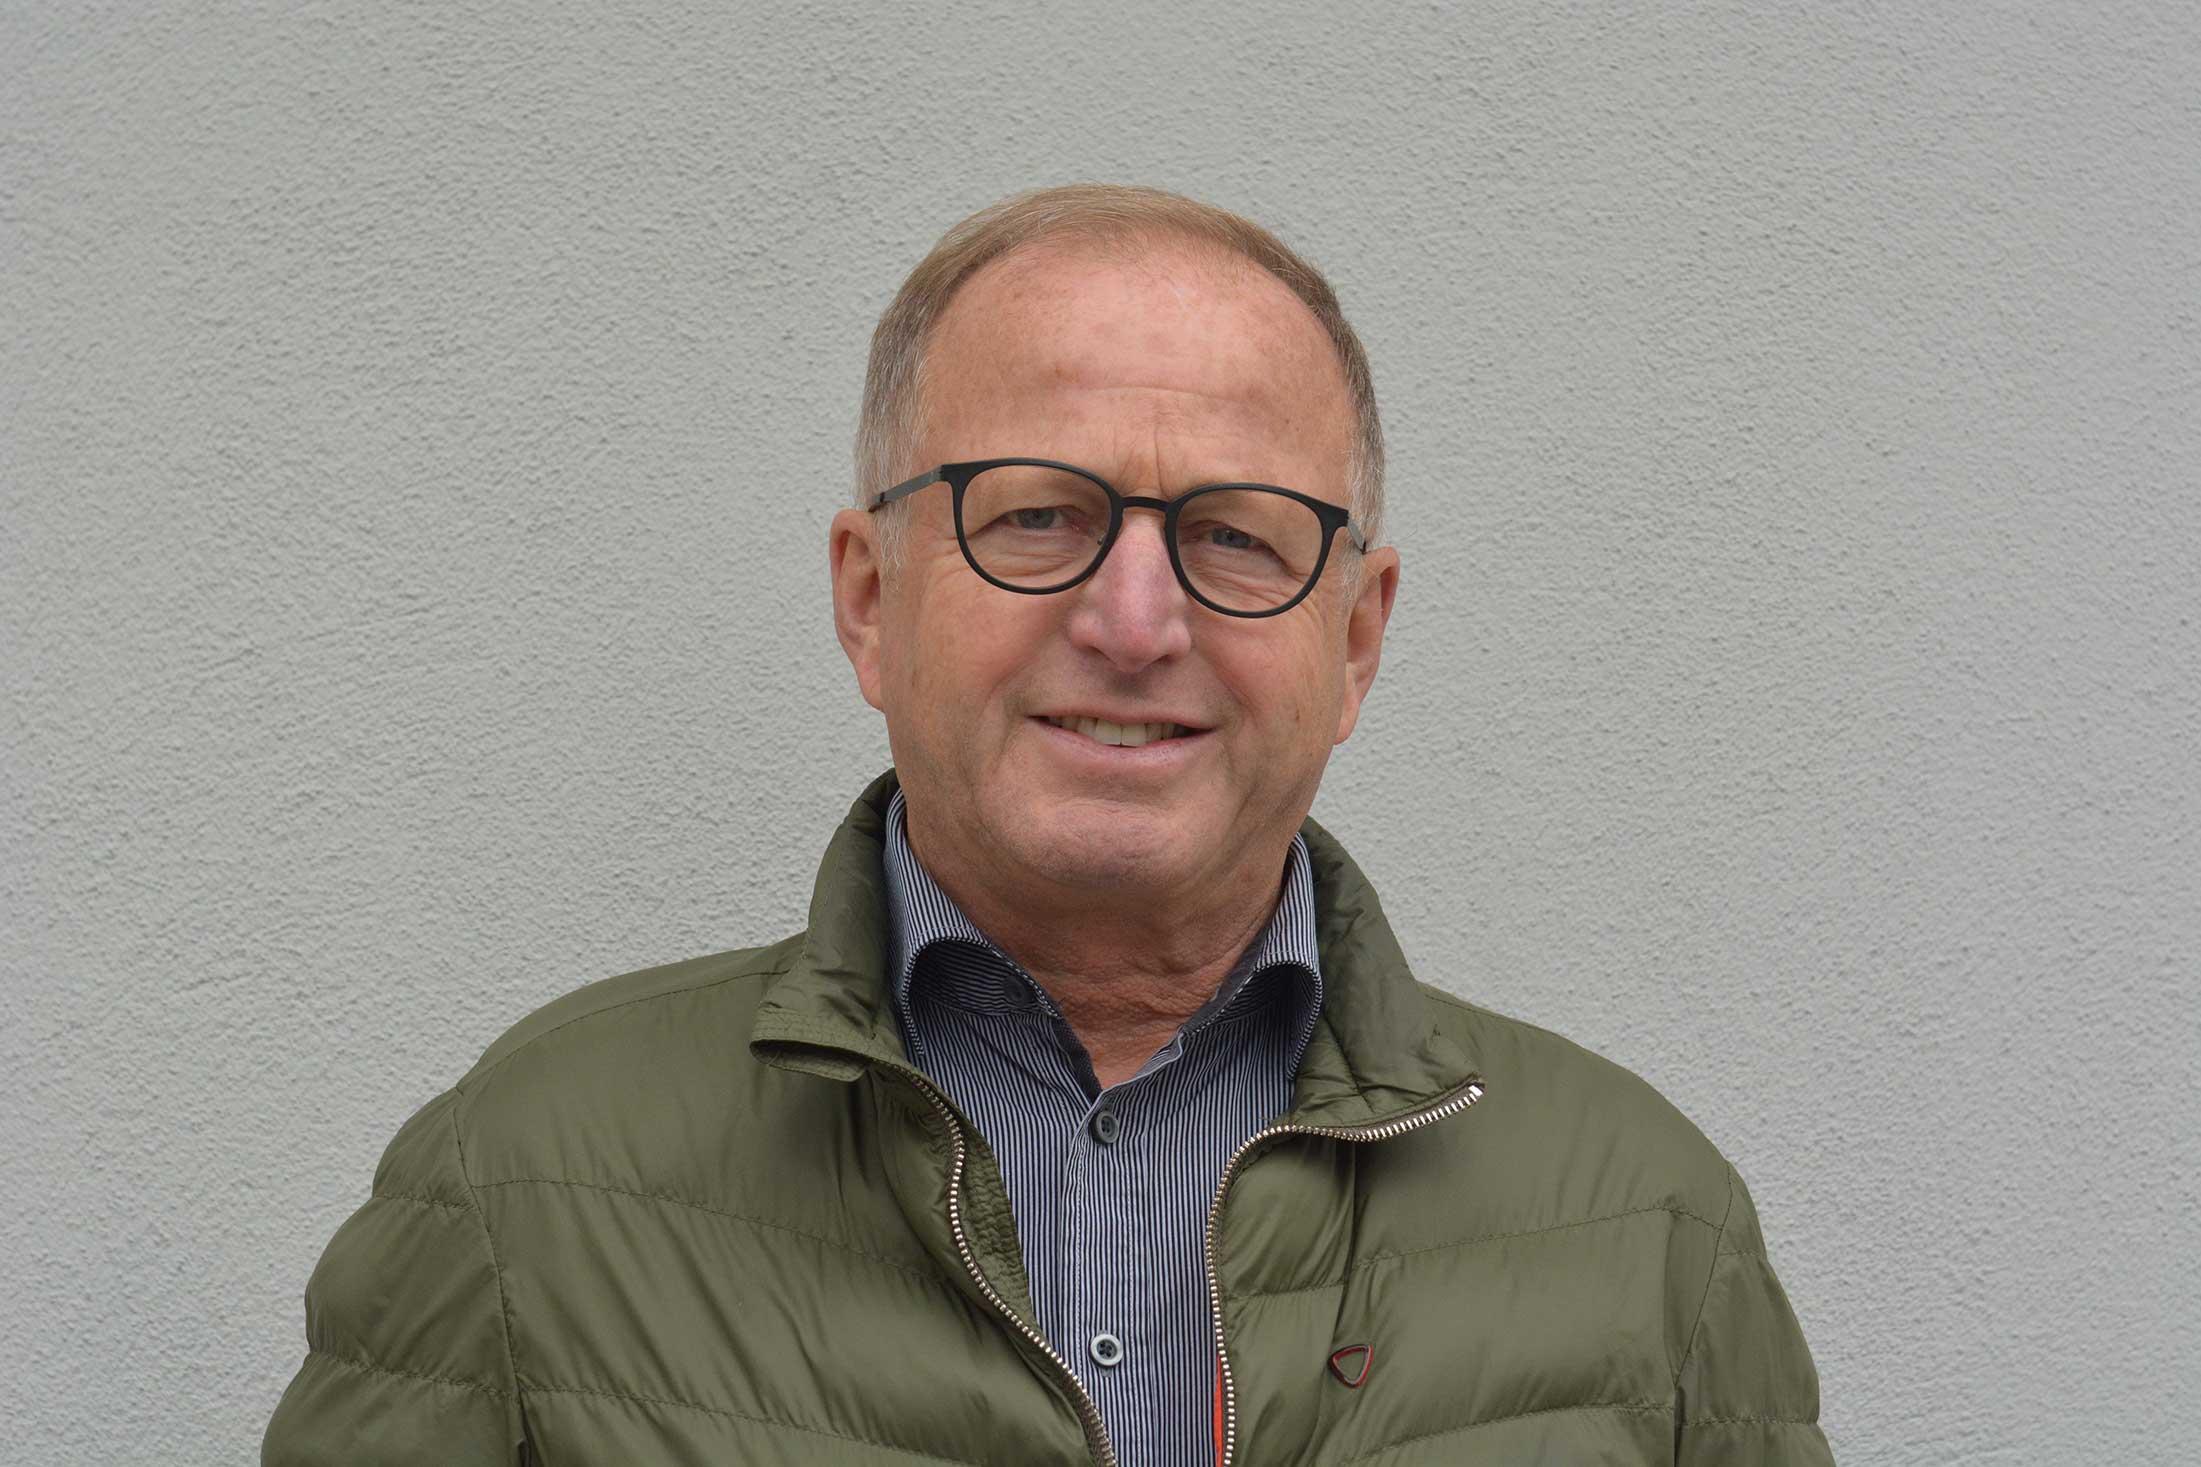 Rudi Rörich